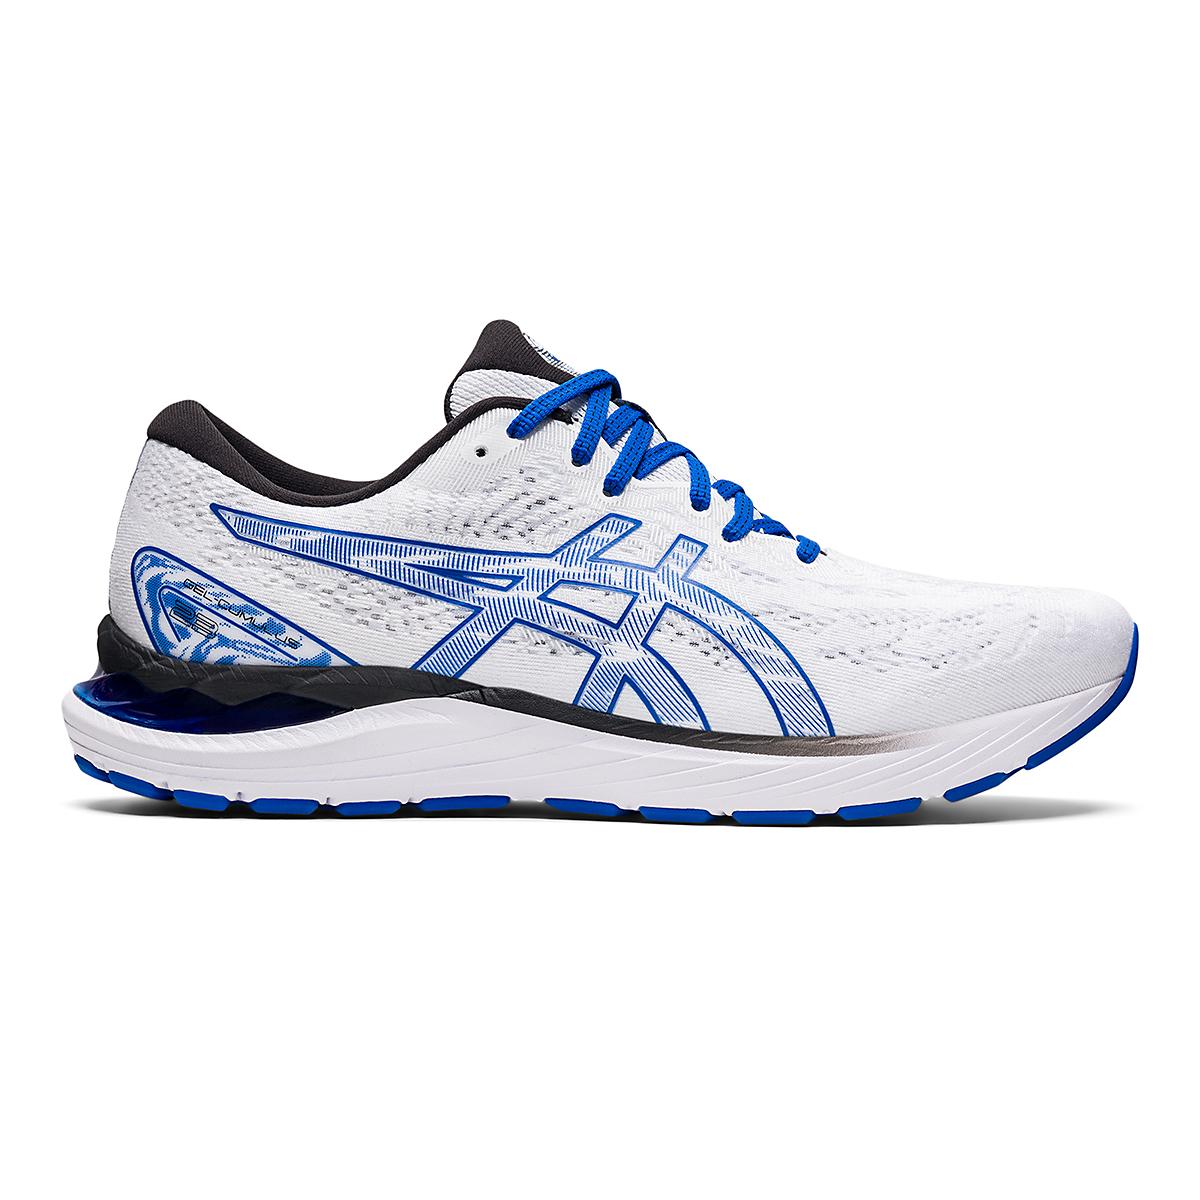 Men's Asics SMU Gel-Cumulus 23 Running Shoe - Color: White/Tuna Blue - Size: 6 - Width: Regular, White/Tuna Blue, large, image 1